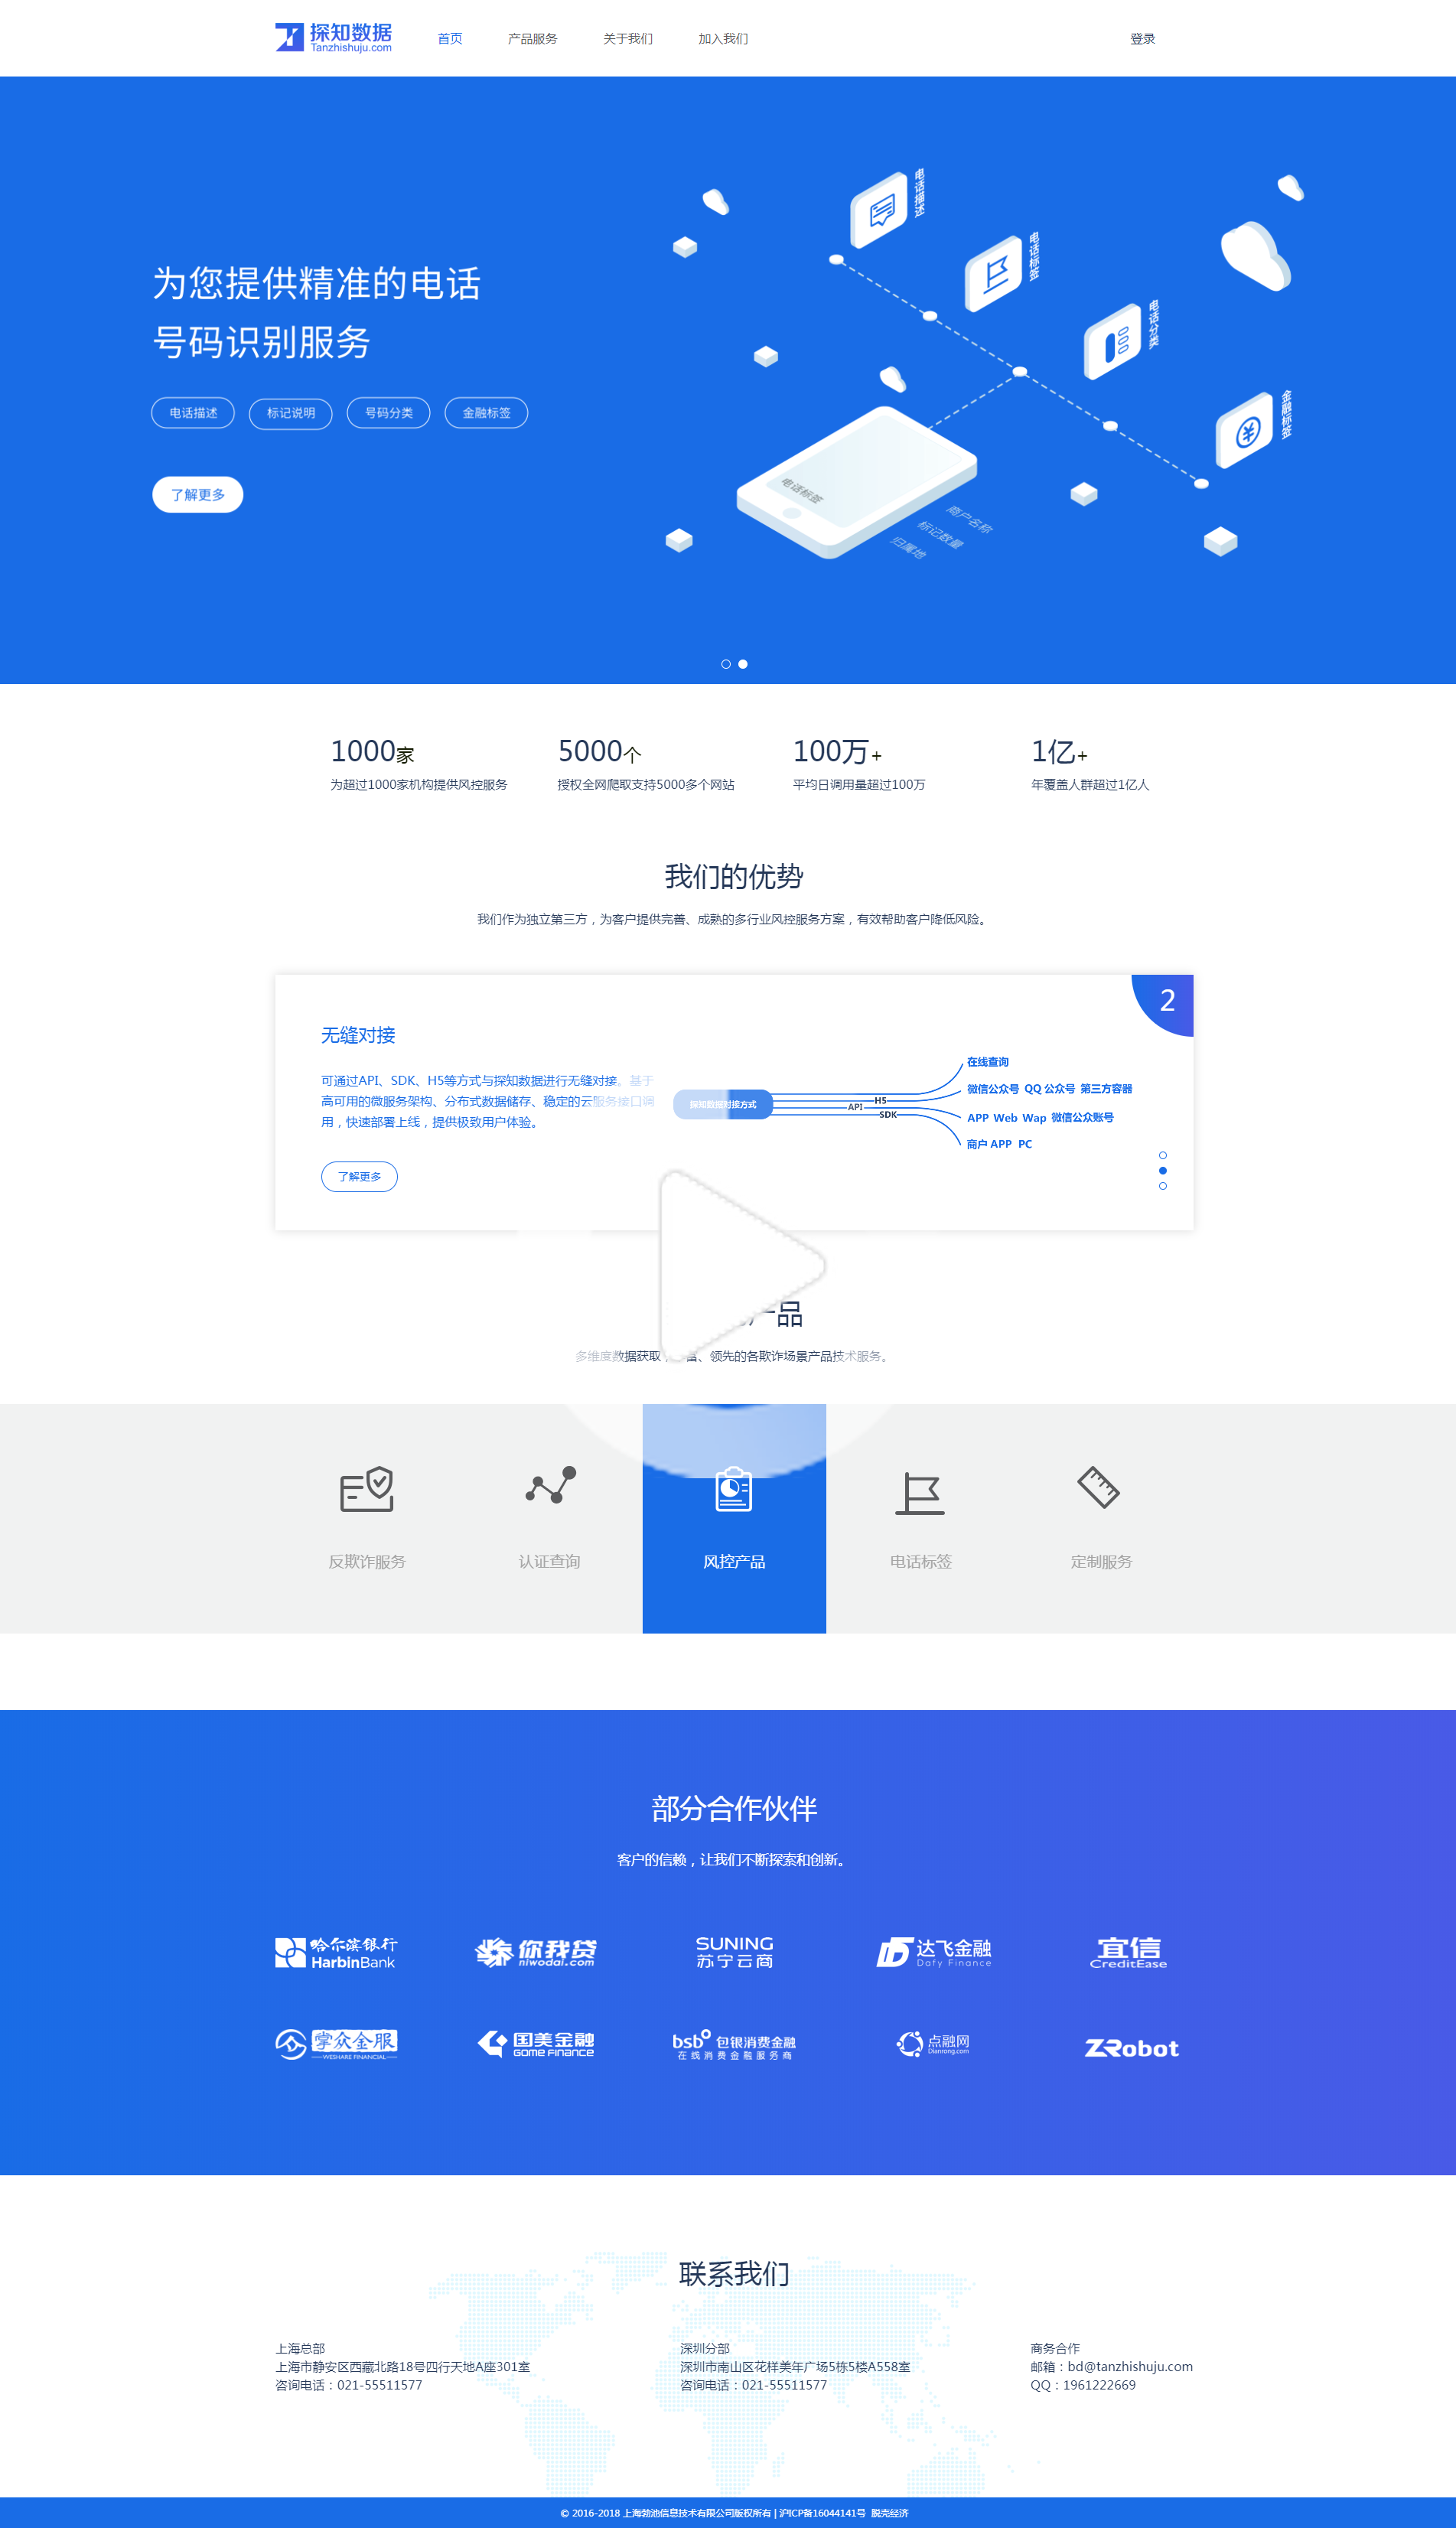 Attractive Blue And Flat Layout Dizajn Prilozheniya Veb Dizajn Dizajn Veb Sajtov